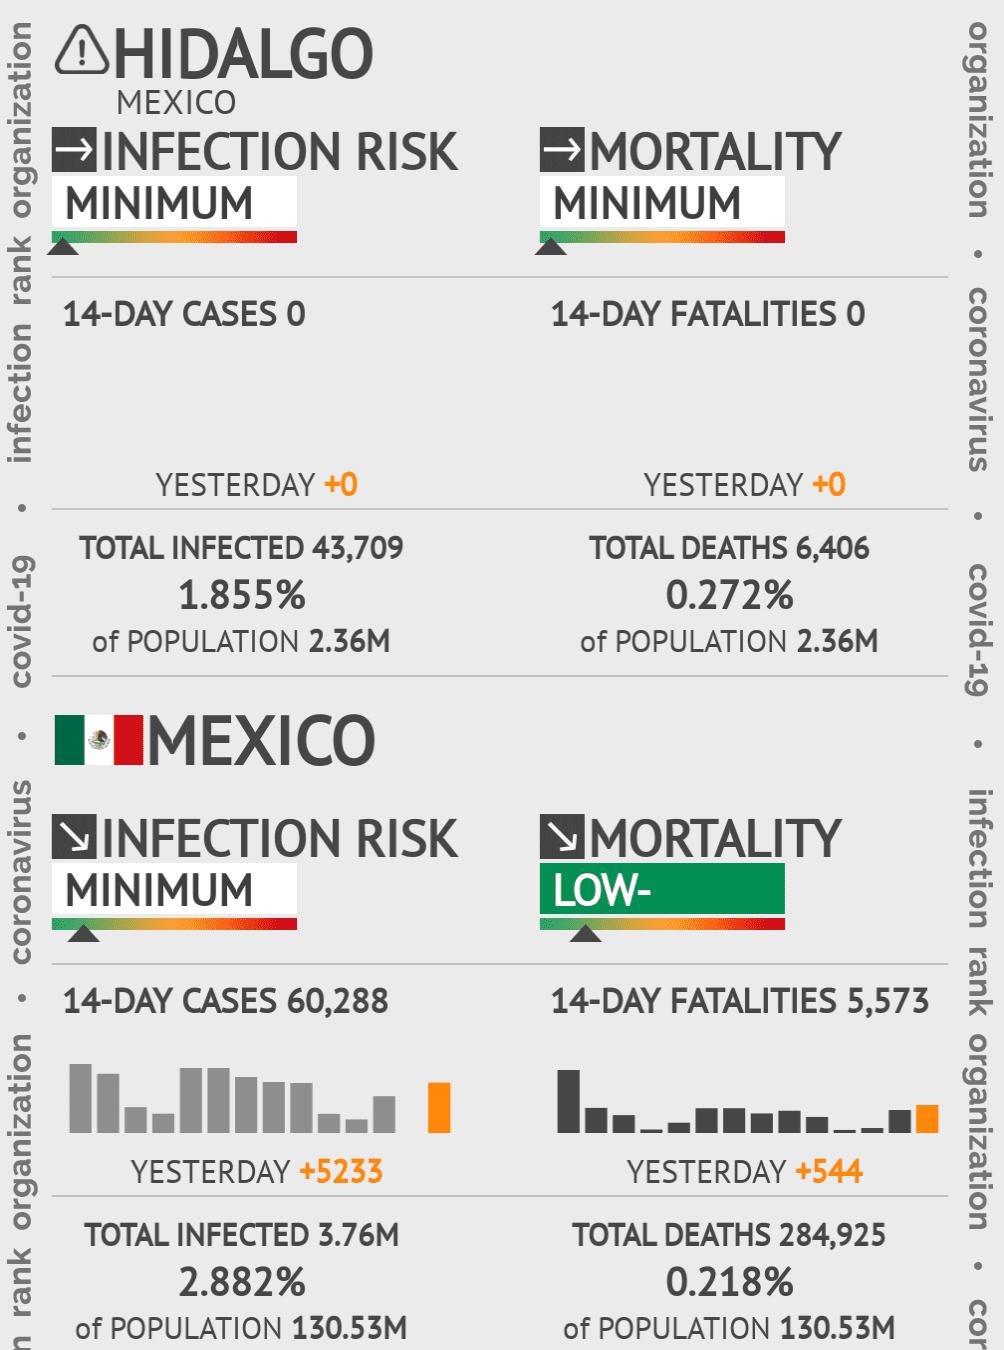 Hidalgo Coronavirus Covid-19 Risk of Infection on March 03, 2021